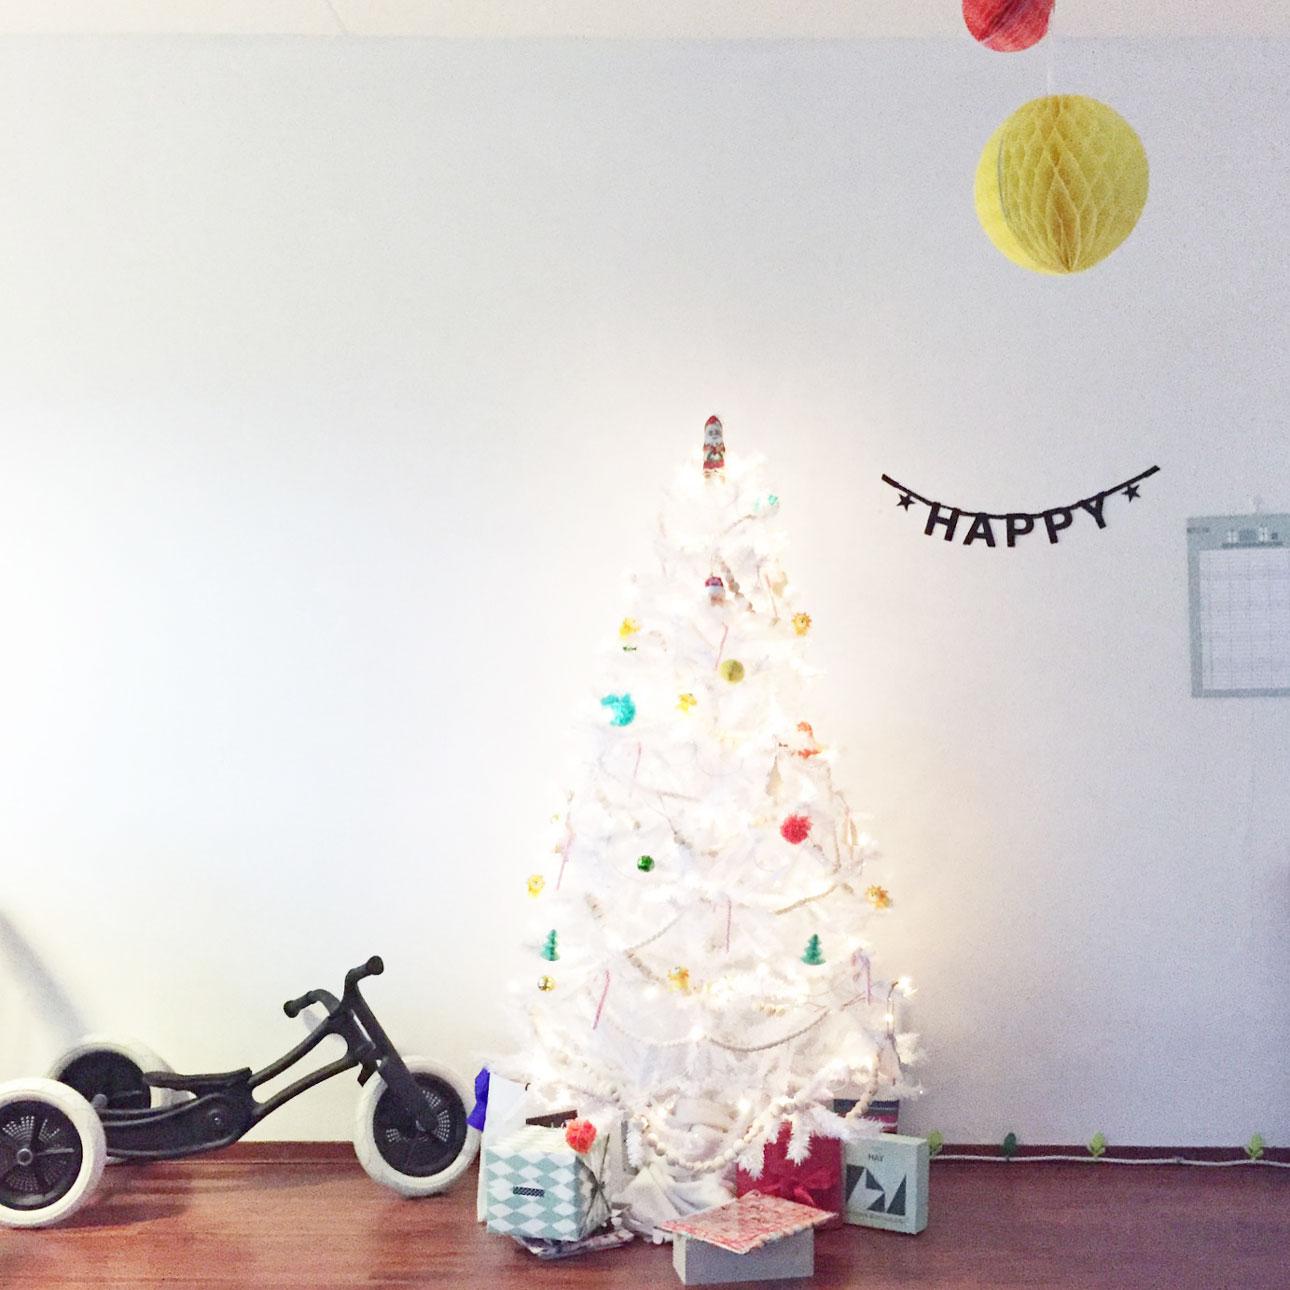 Mamalifestyle december 2015 Kerstfeest